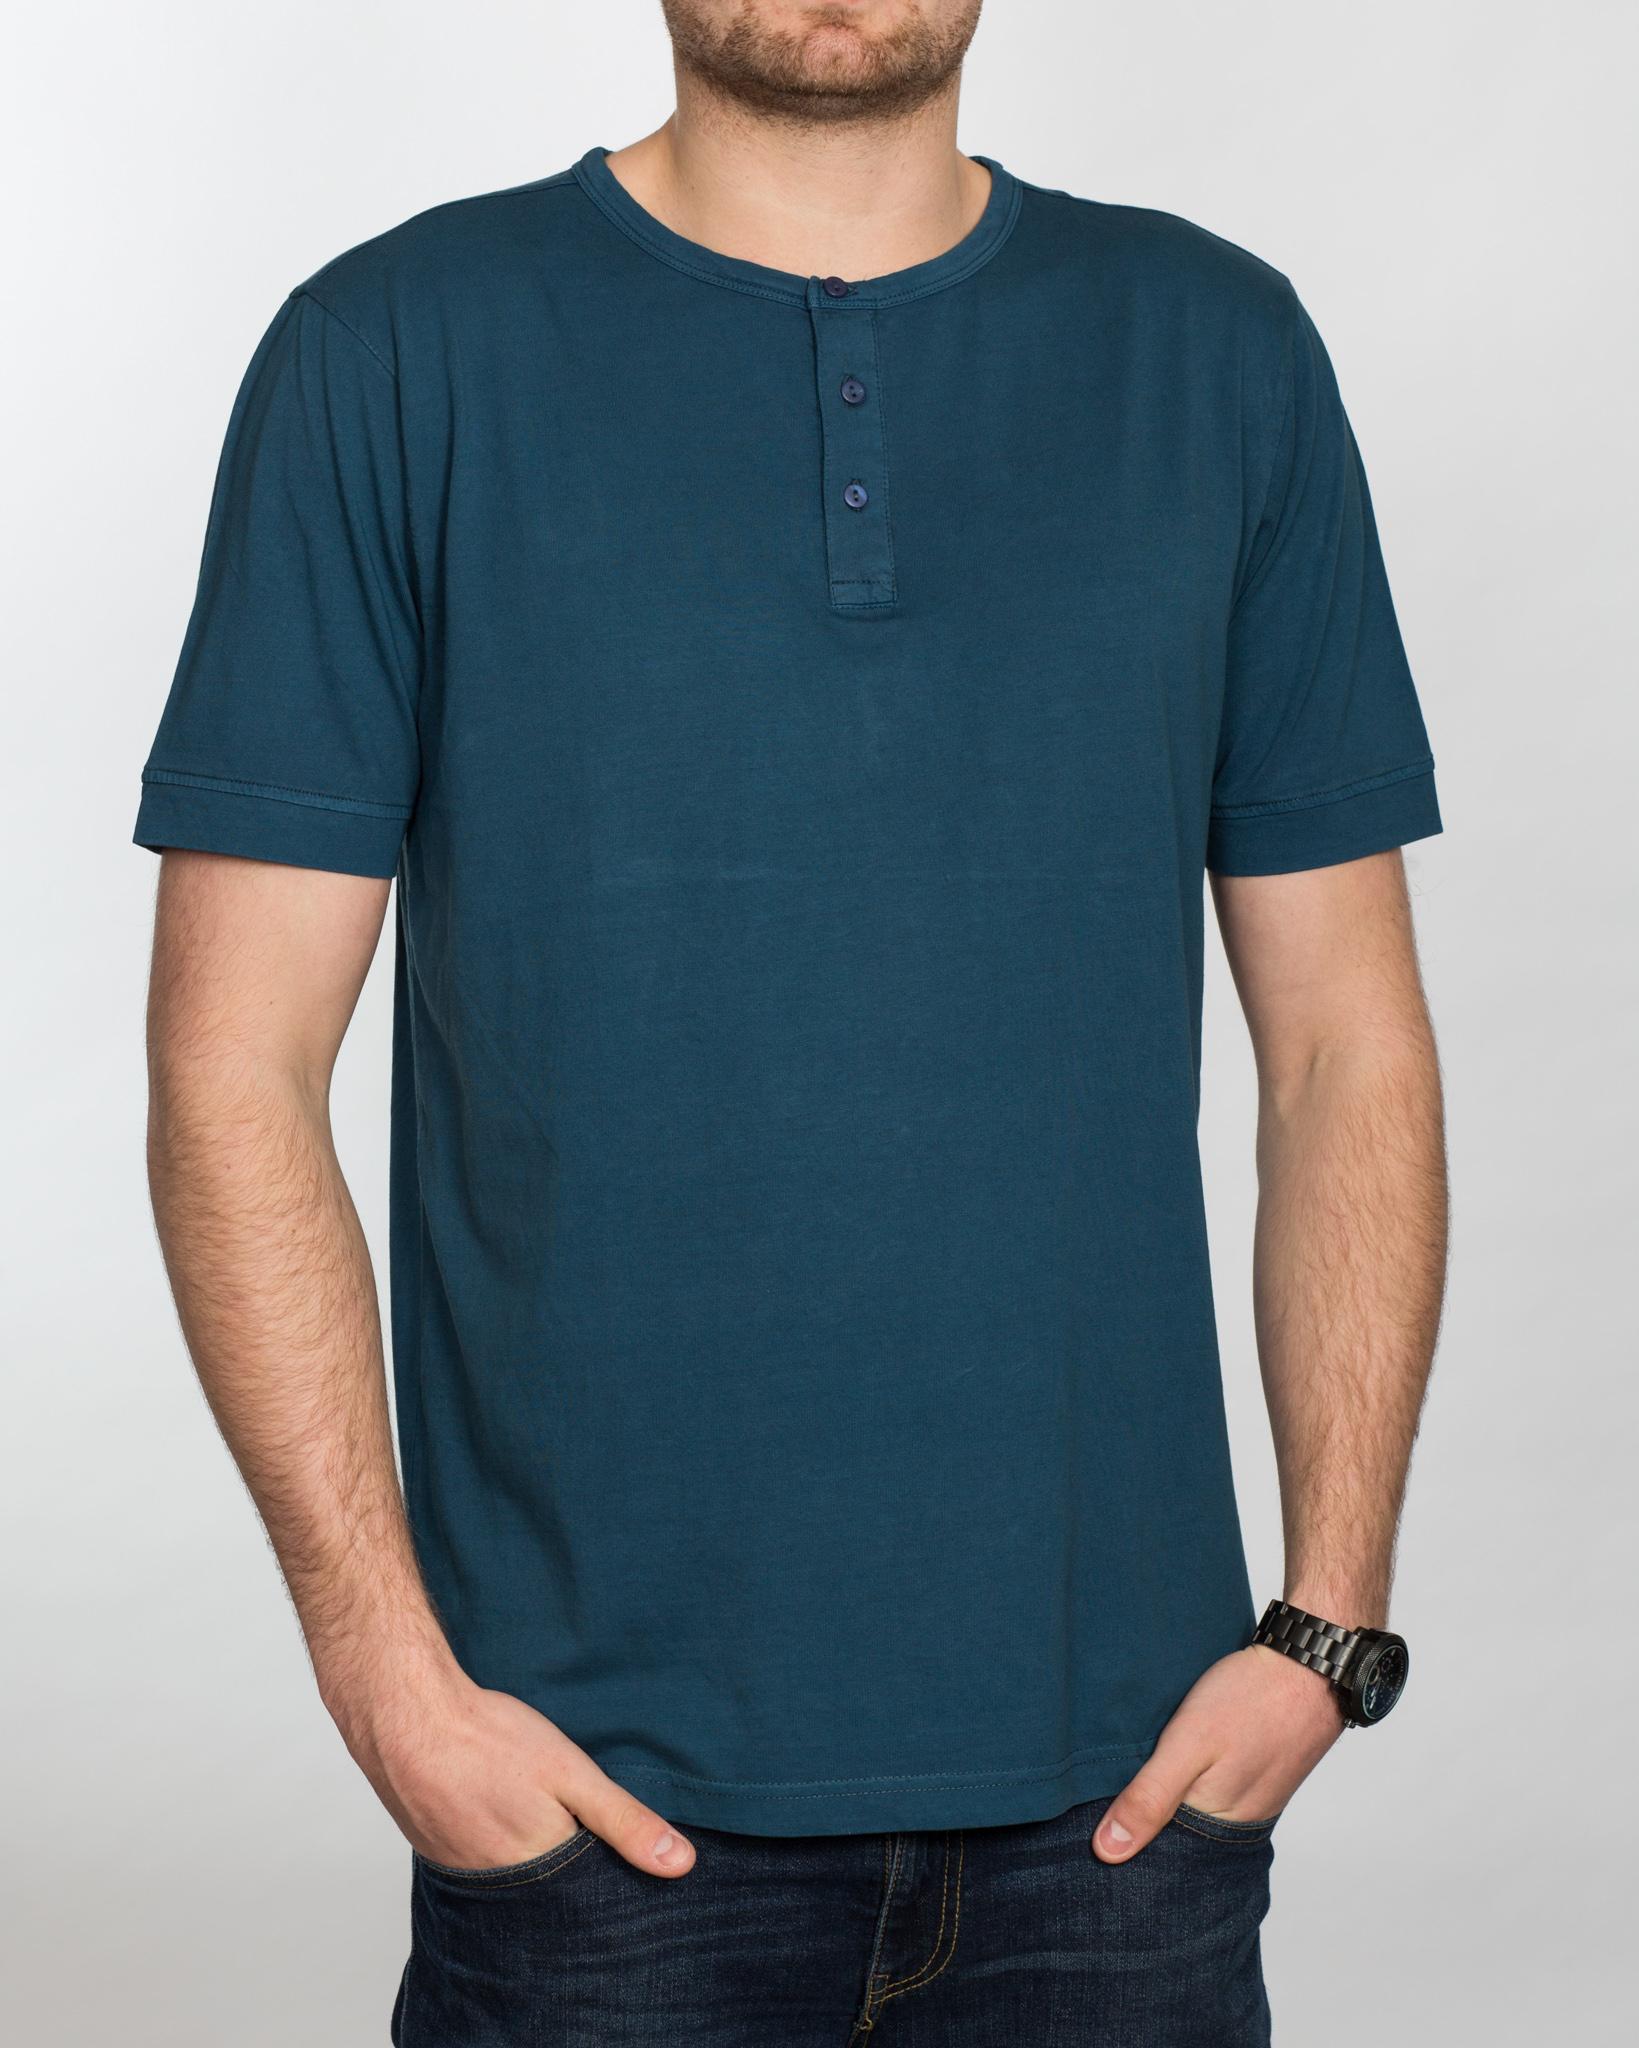 Replica Grandad Shirt (petrol)